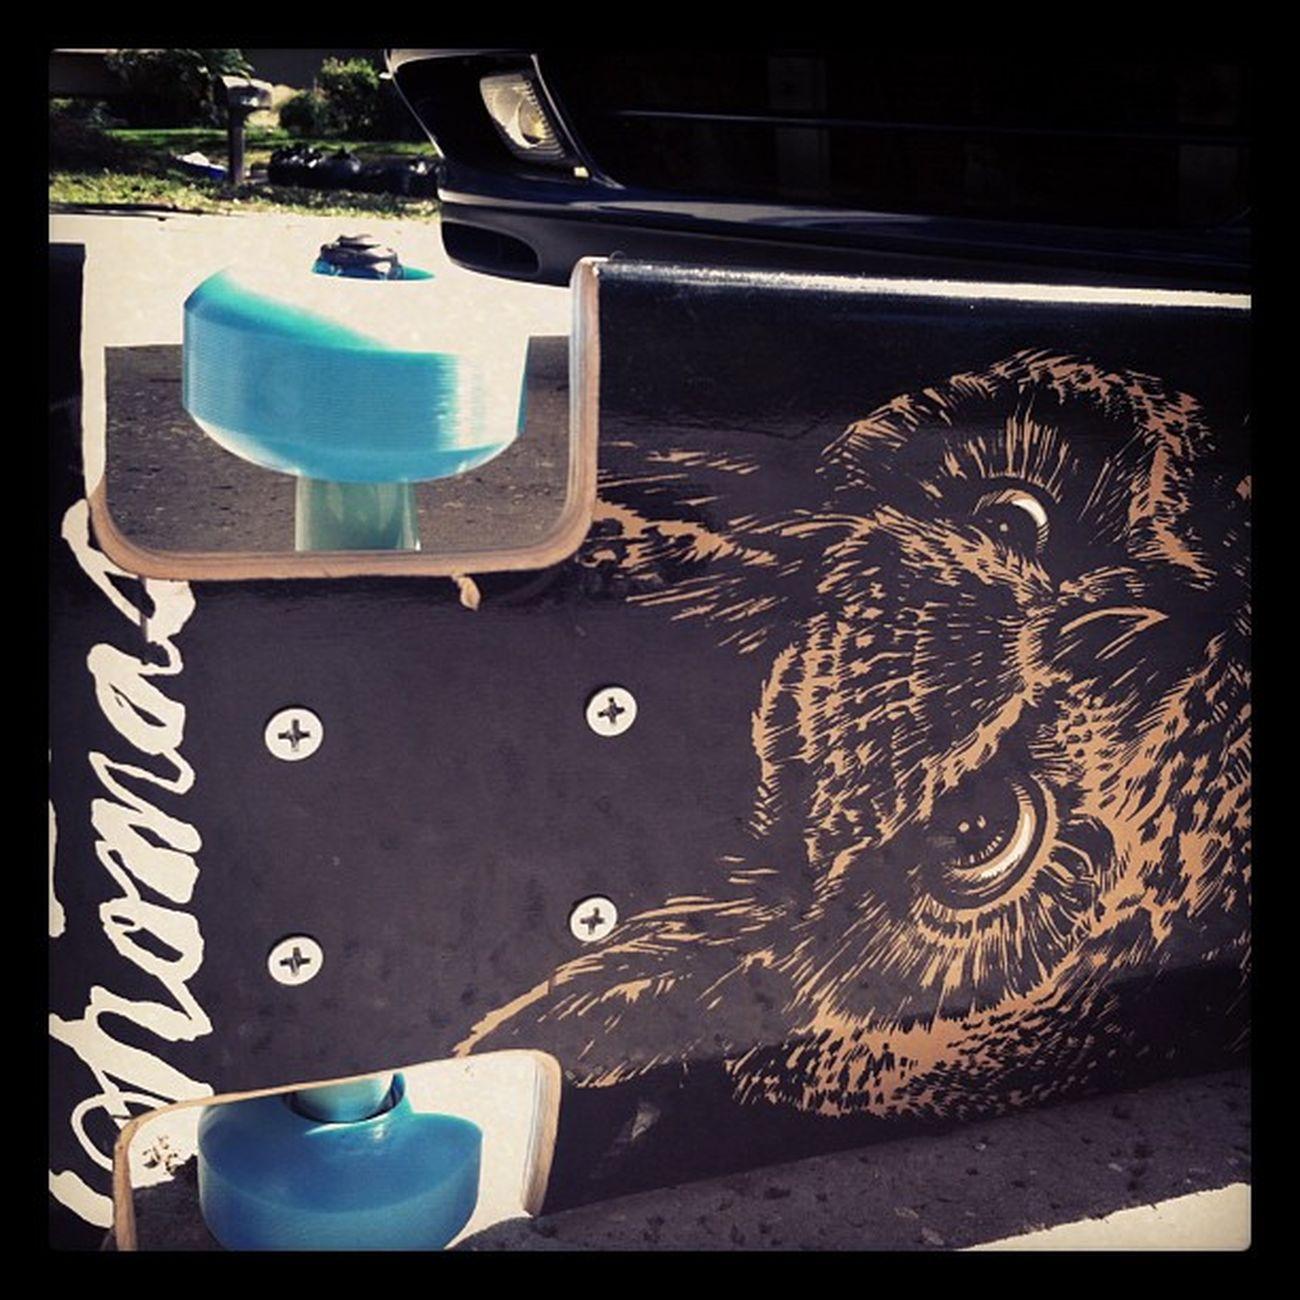 Zero Illest Ilovedrivingslow S14 skateboarding nissan @bret240